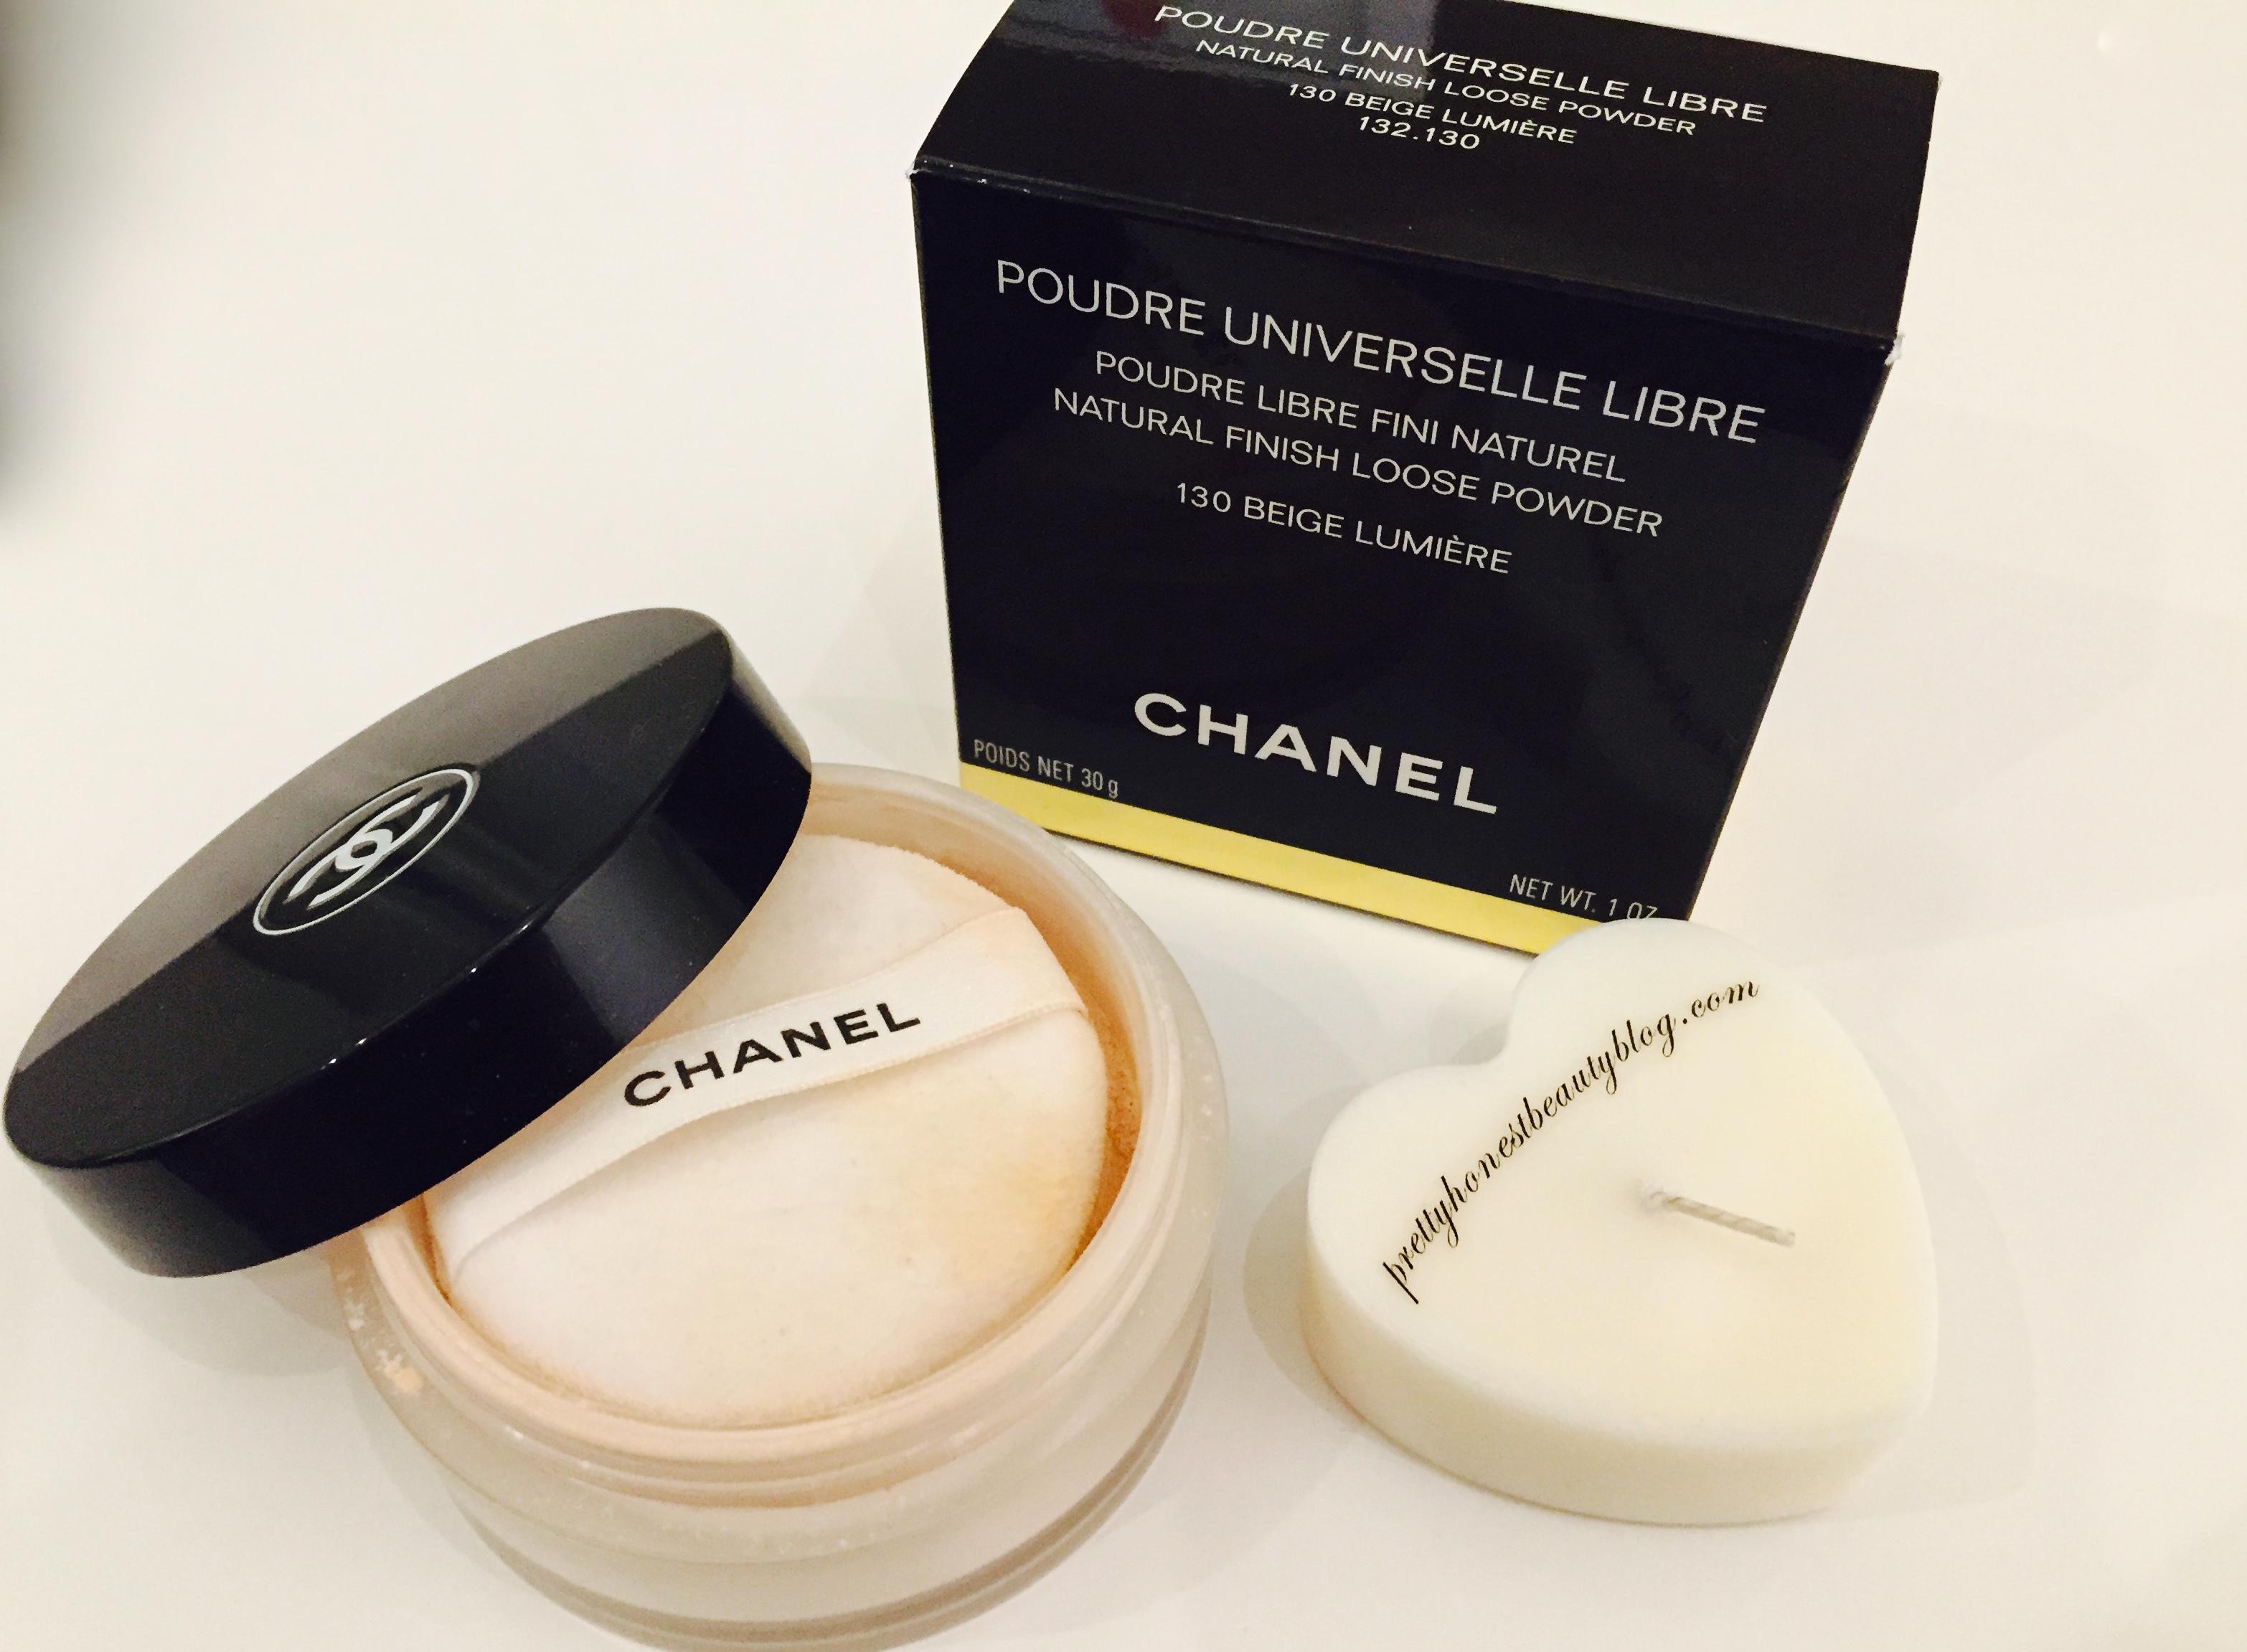 Img 7578 Prettyhonestbeautyblog Chanel Poudre Universelle Libre